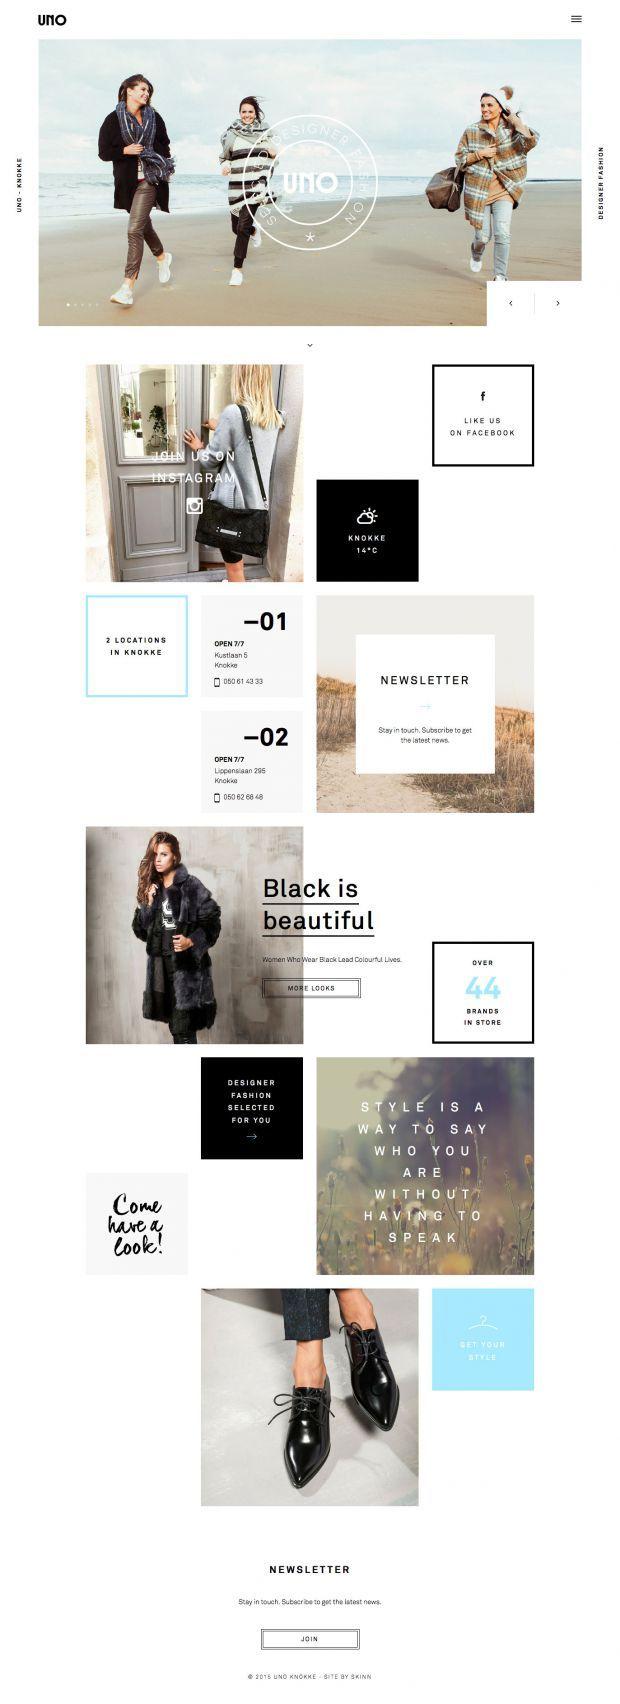 Uno Knokke - Selected Designer Fashion - Barbara Bui, Pinko, Patrizia Pepe, Clio Goldbrenner, Enes, Baum und pferdgarten - Best Webdesign inspiration on www.niceoneilike.com